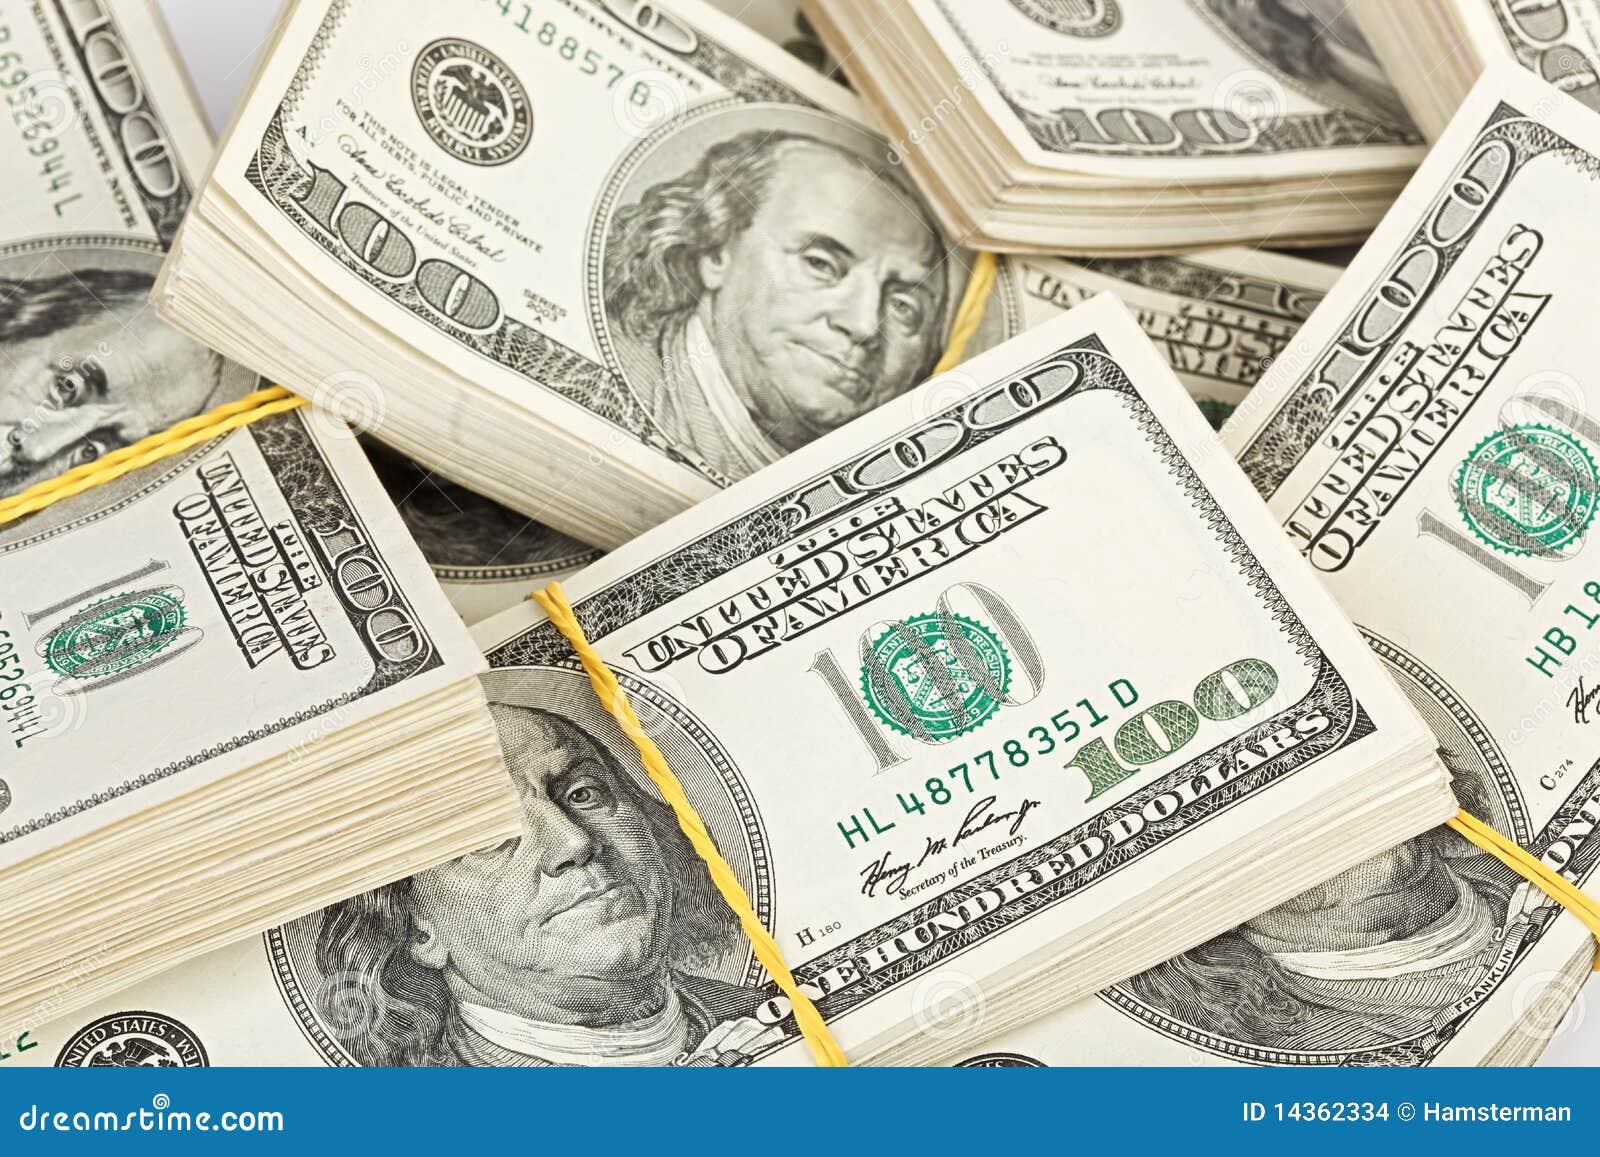 Million dollar forex plan